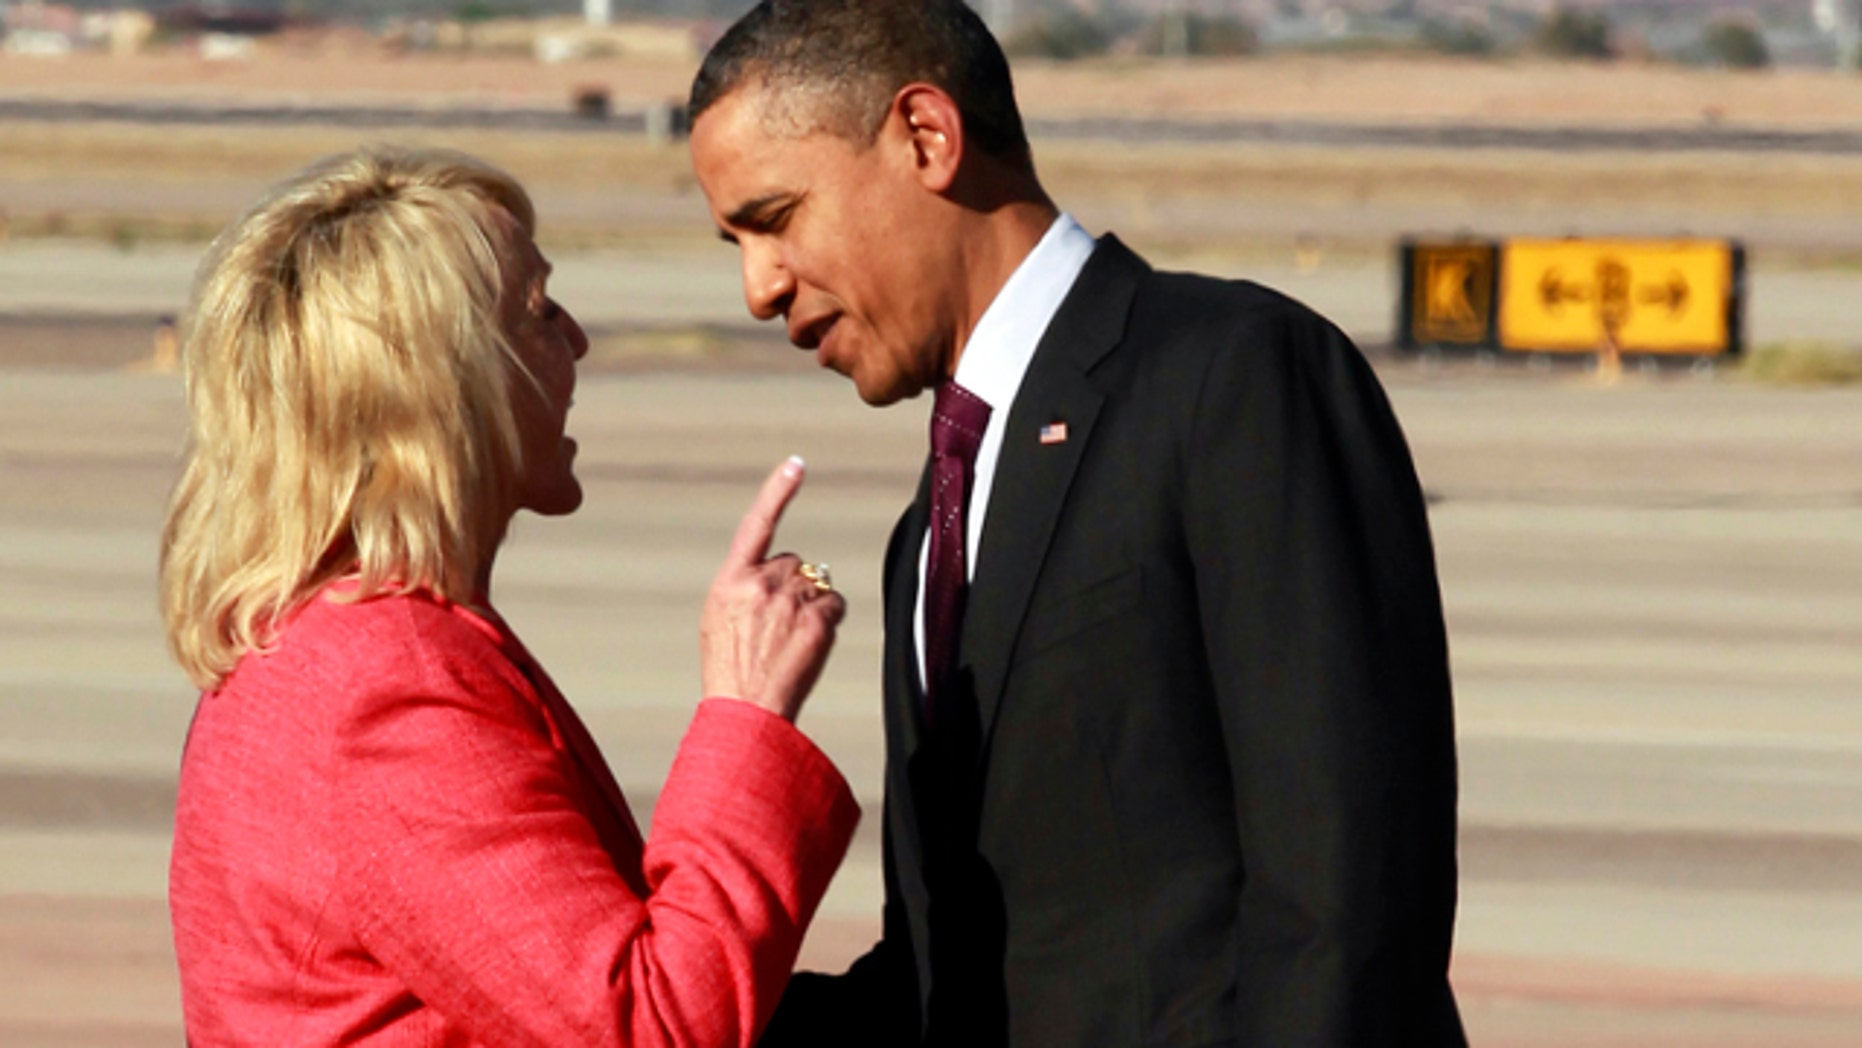 Jan. 25, 2012: Arizona Gov. Jan Brewer points at President Obama after he arrived at Phoenix-Mesa Gateway Airport.